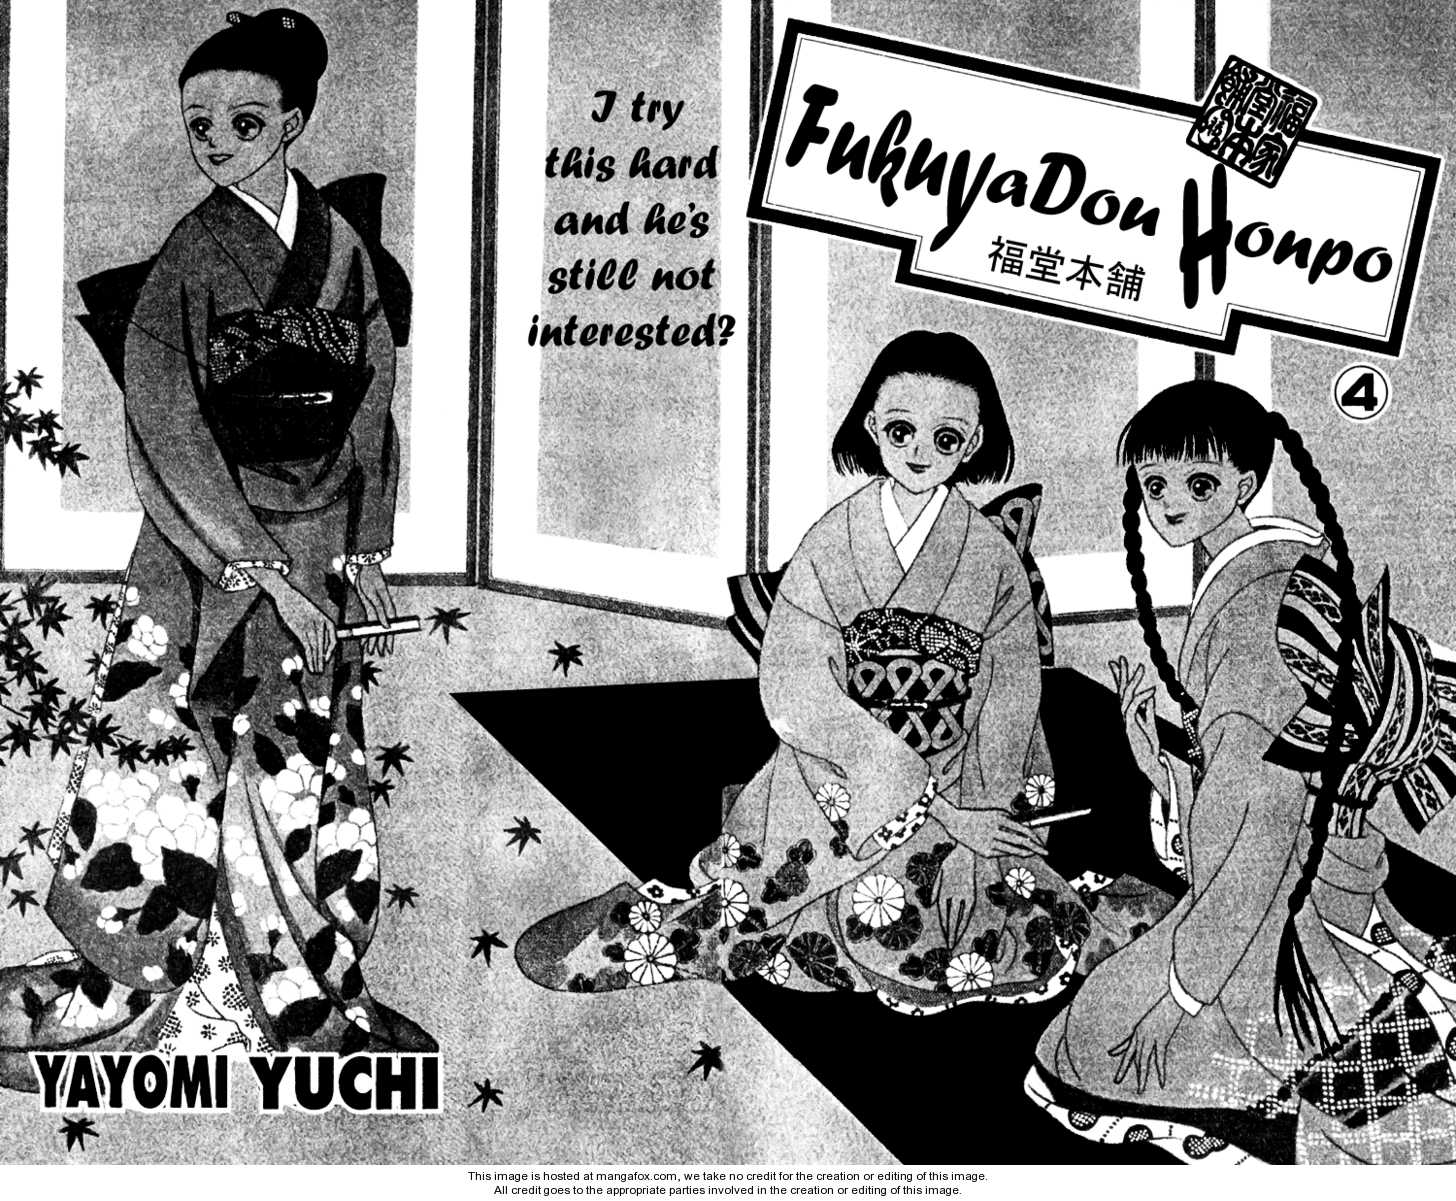 Fukuyadou Honpo 13 Page 2